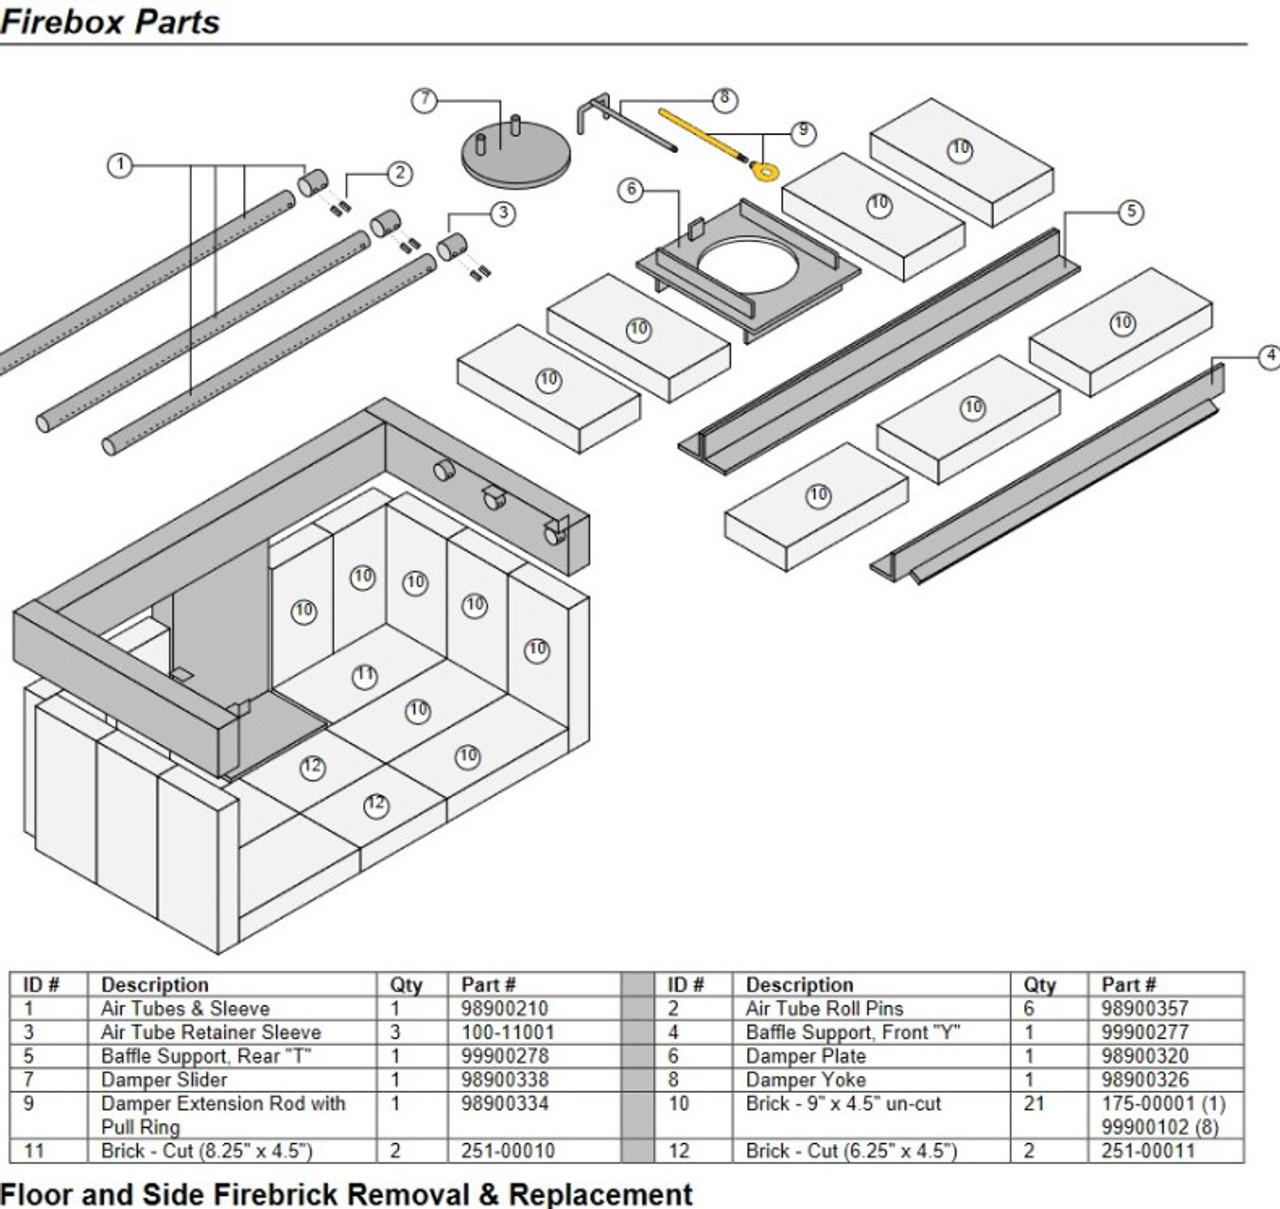 Lopi / Avalon Damper Rod Extension 98900334